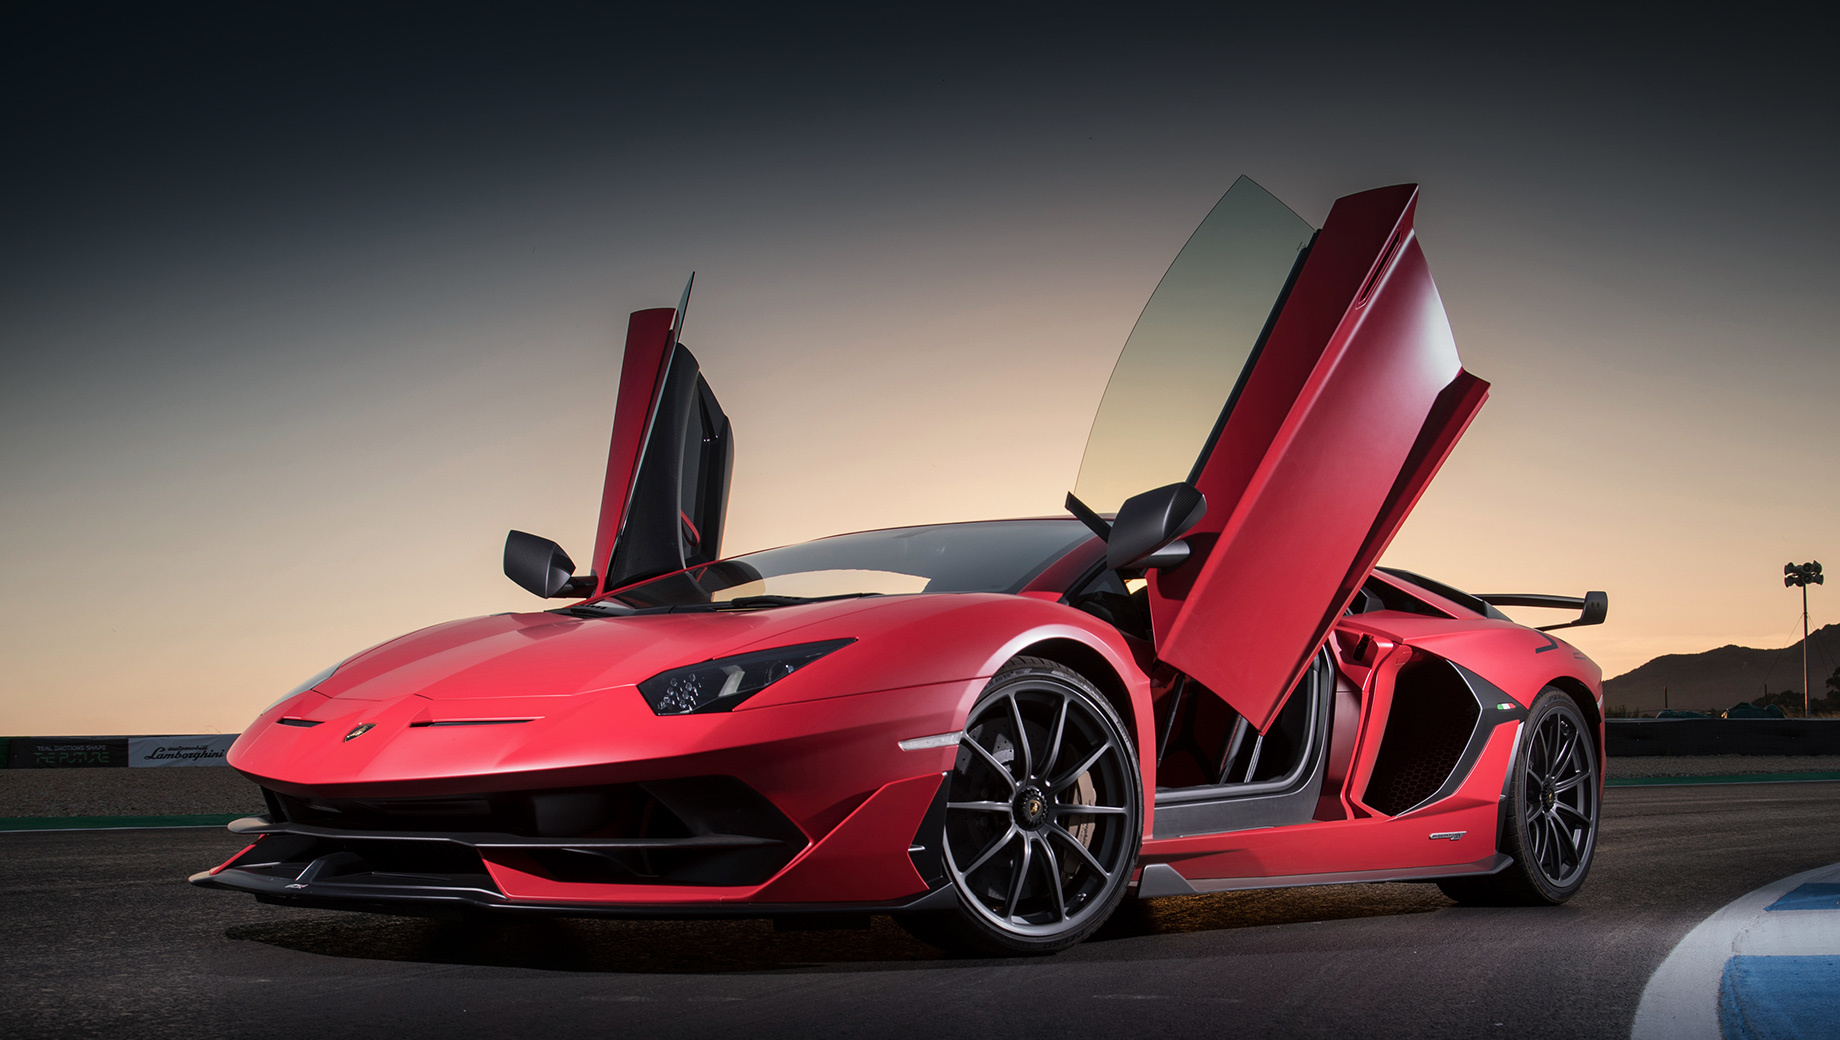 Дополнено: Lamborghini Aventador SVJ отозван из-за механизма дверей